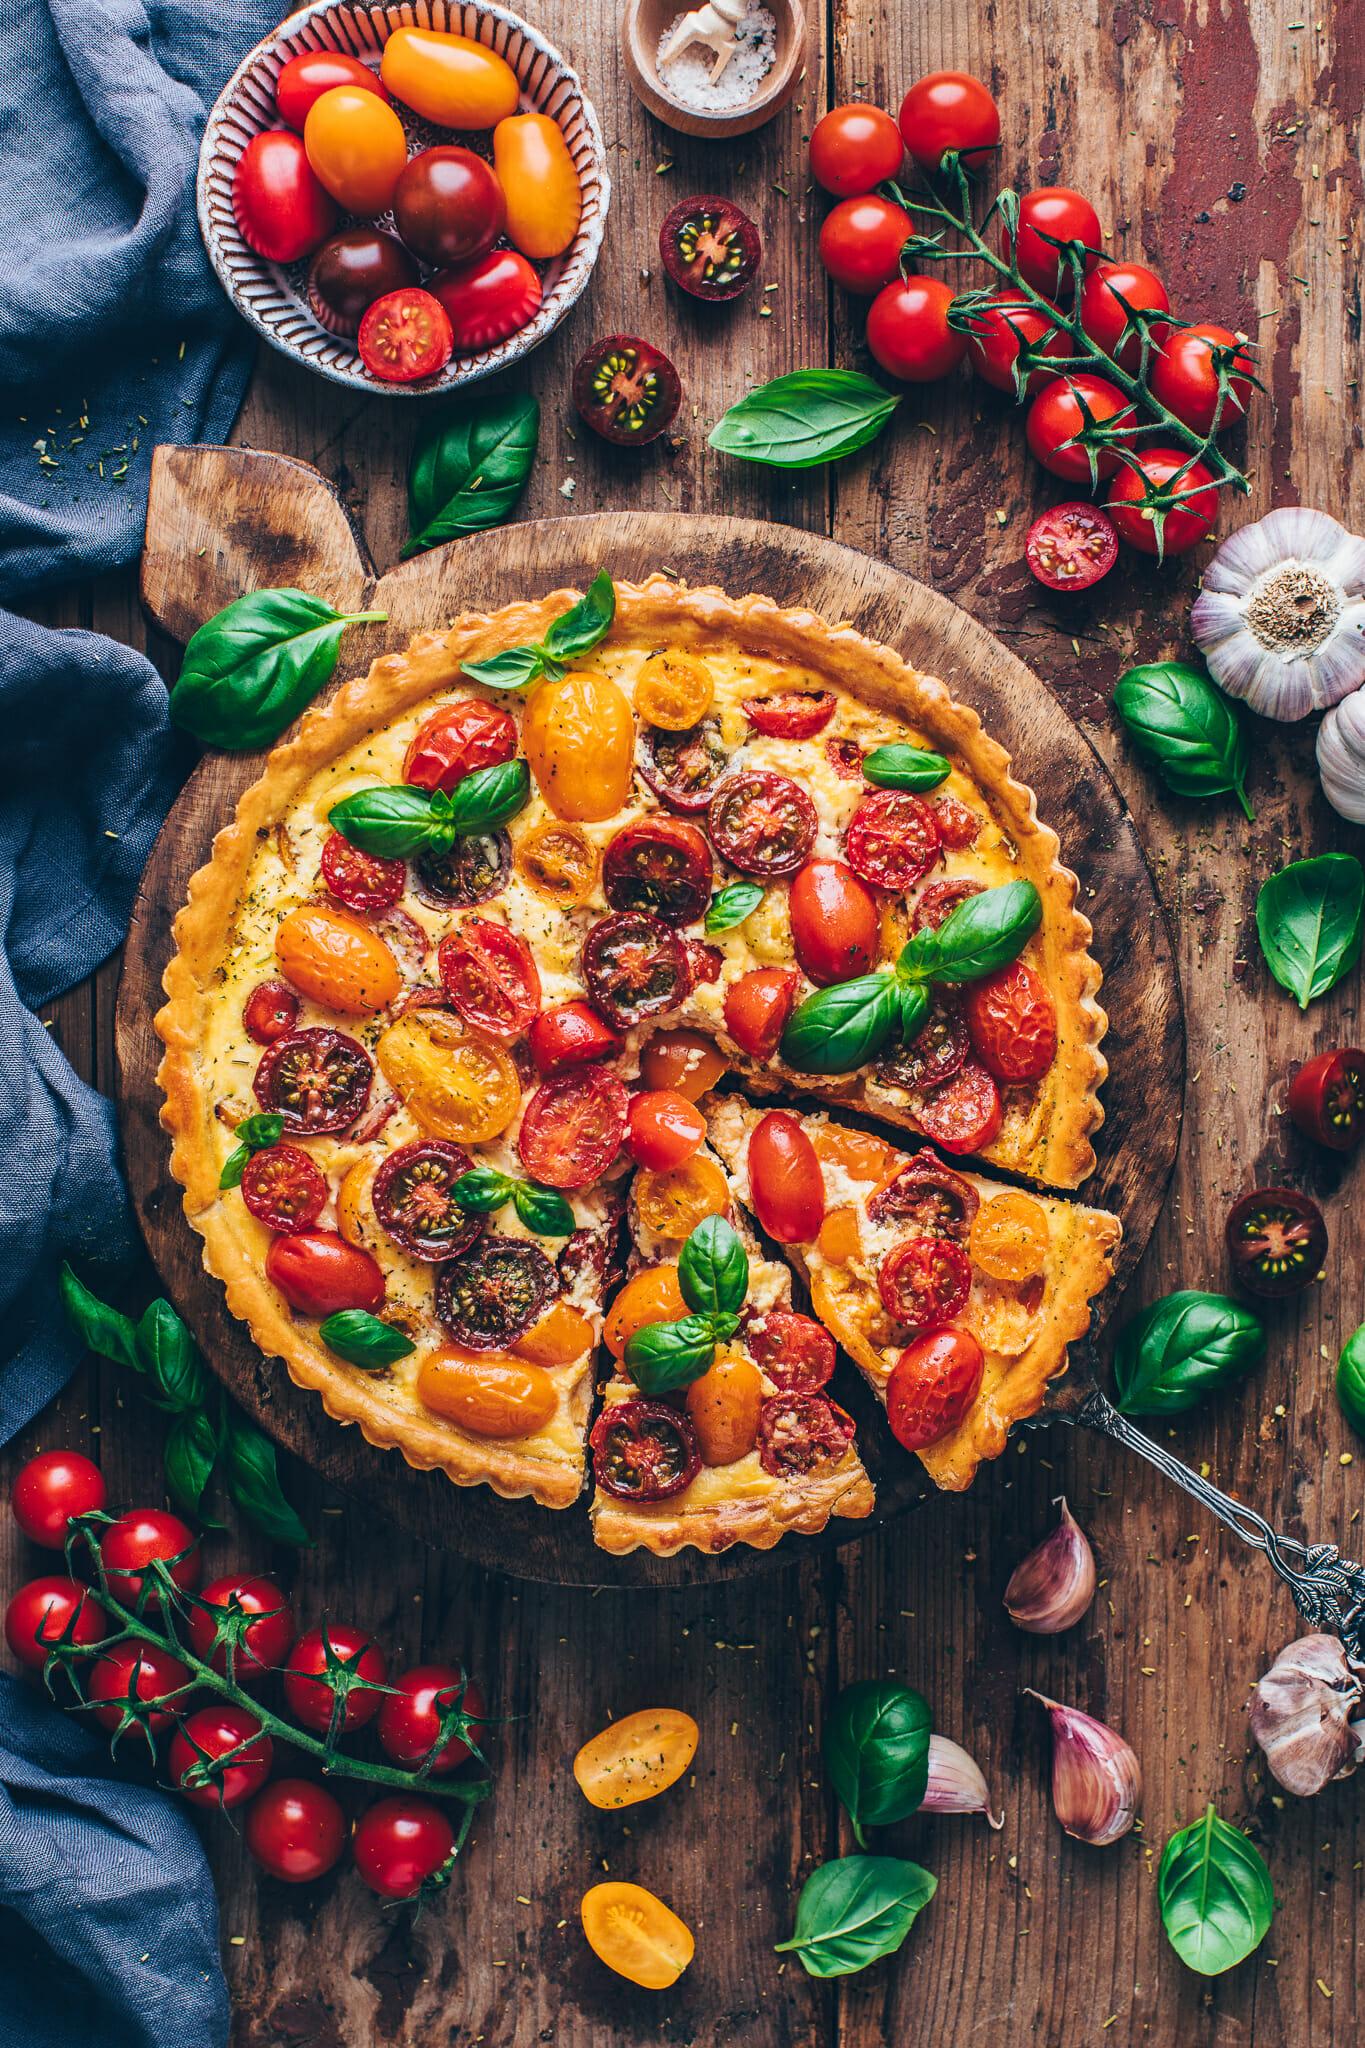 Bunte Tomaten Quiche Tarte mit Basilikum | Food Photography & Styling